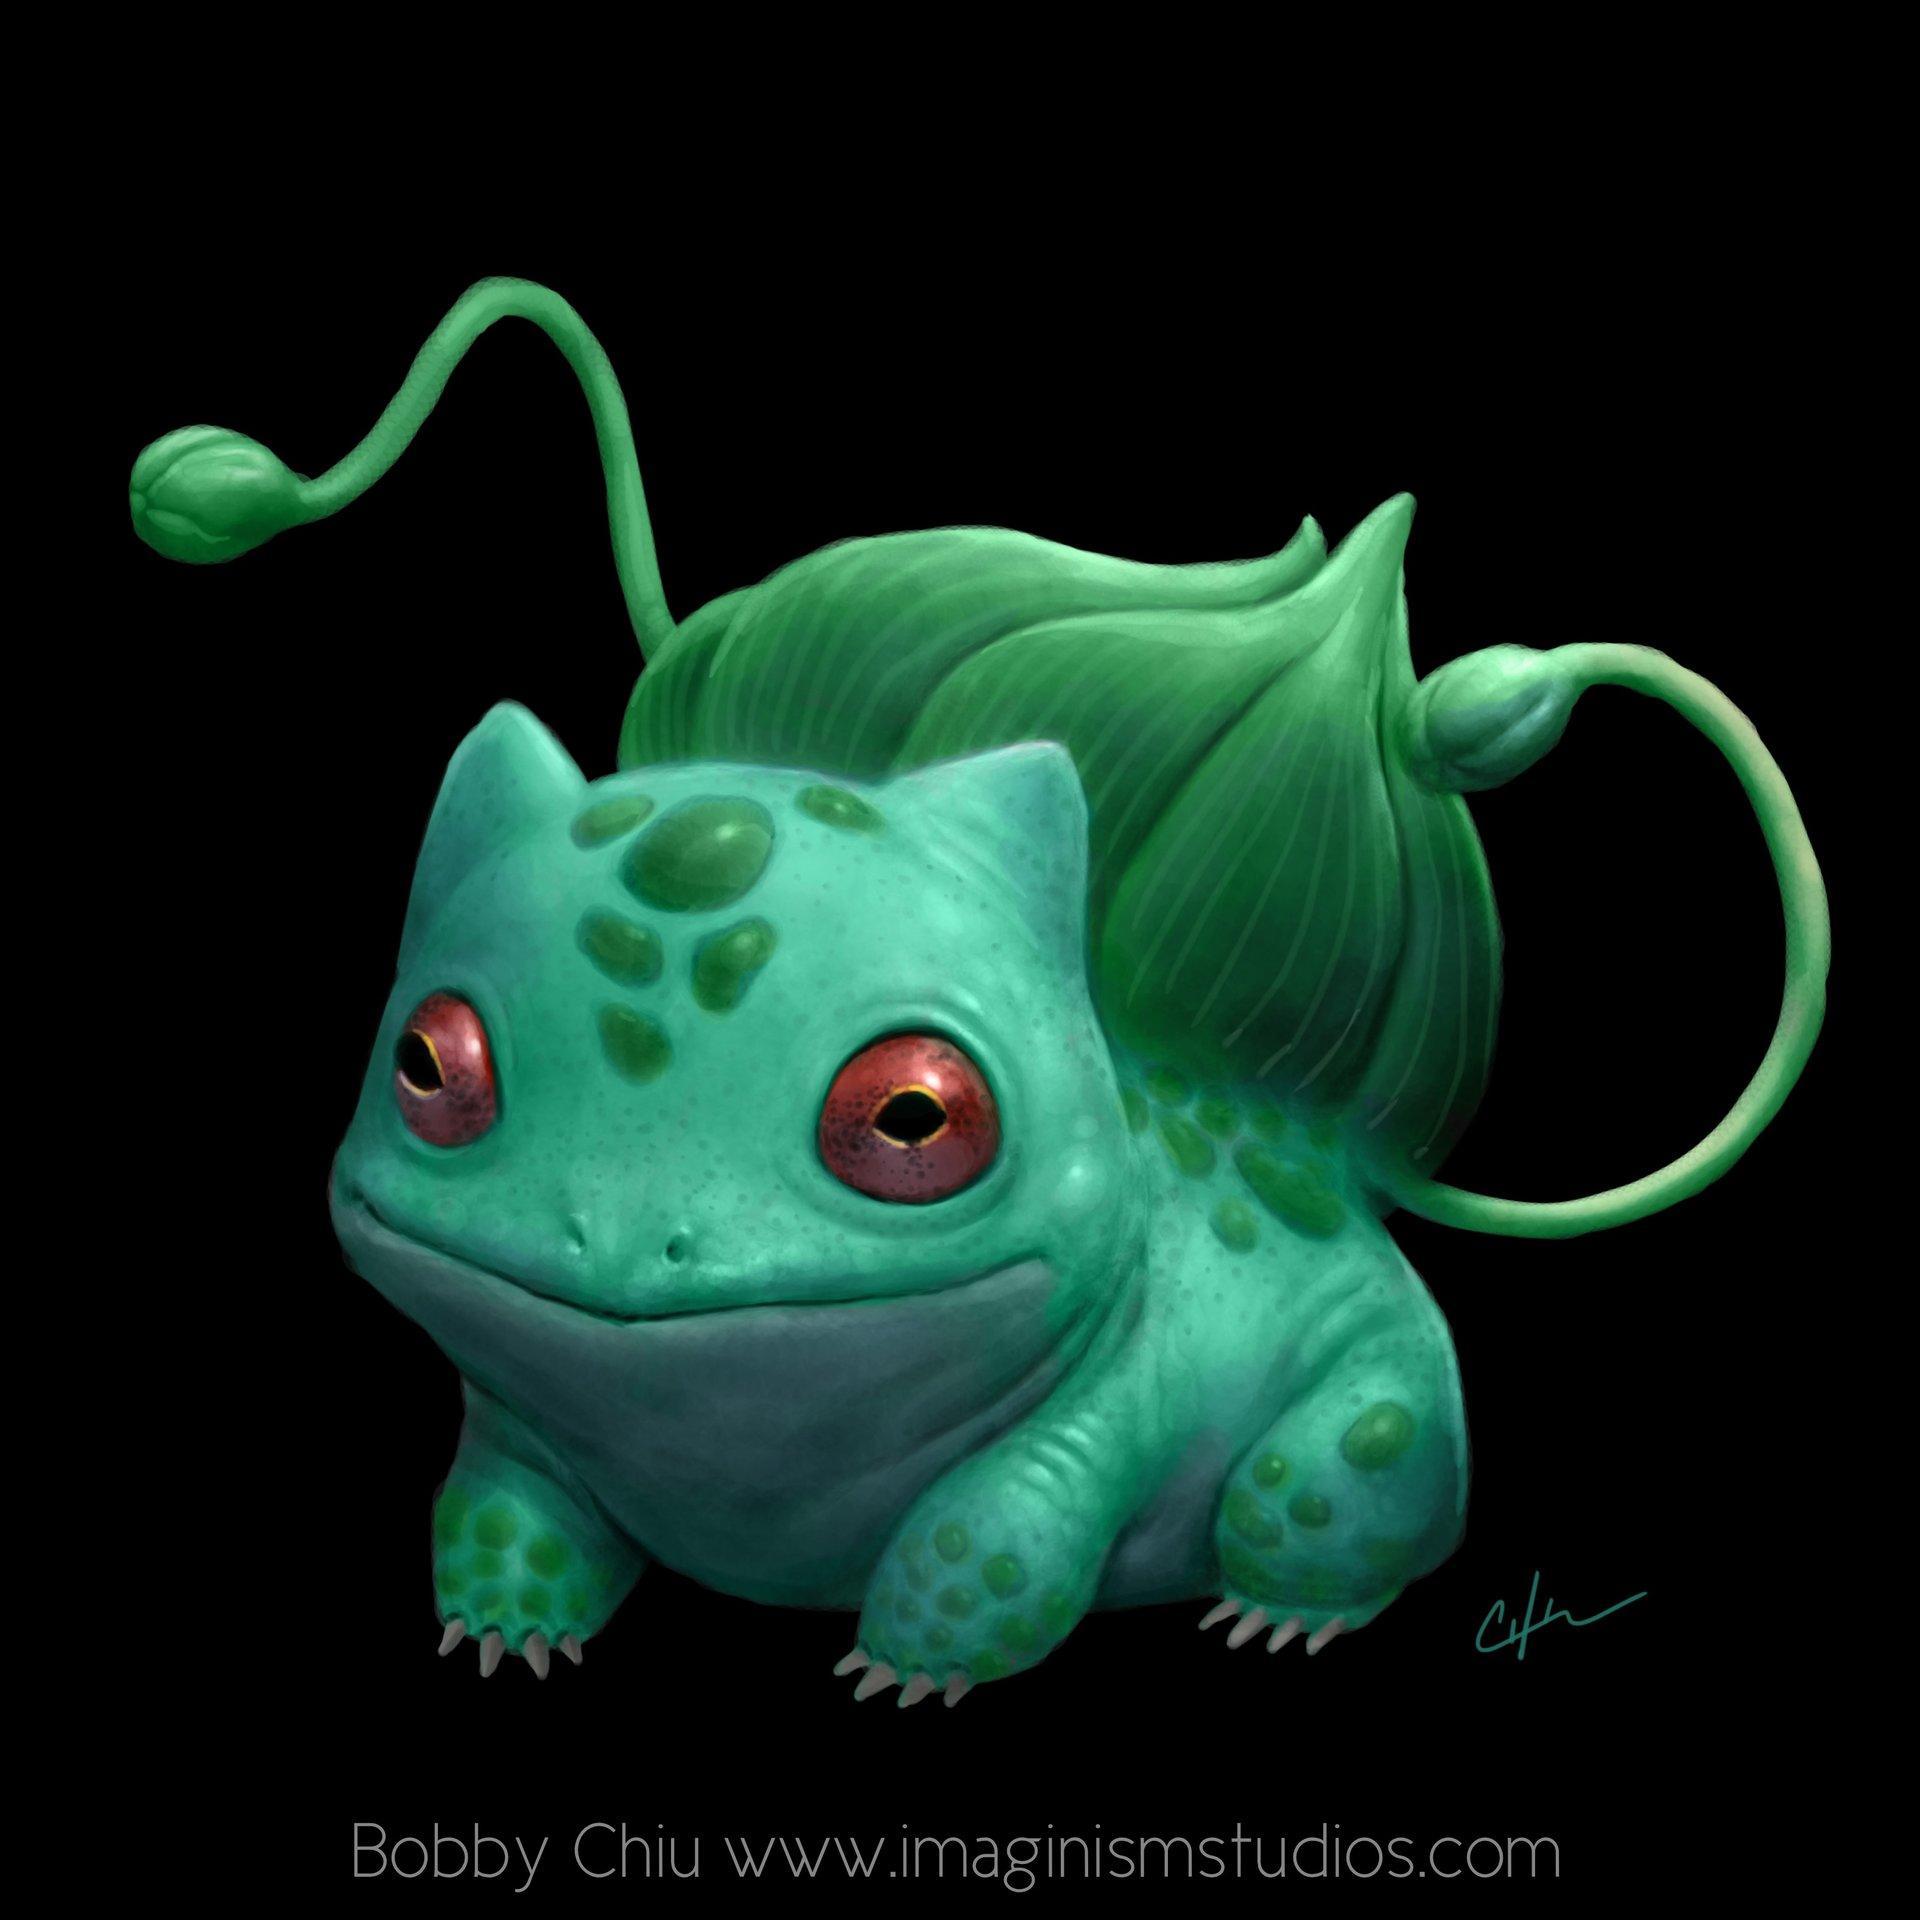 bobby-chiu-live-action-balbasaur-by-imaginism-d7ibi9f.jpg